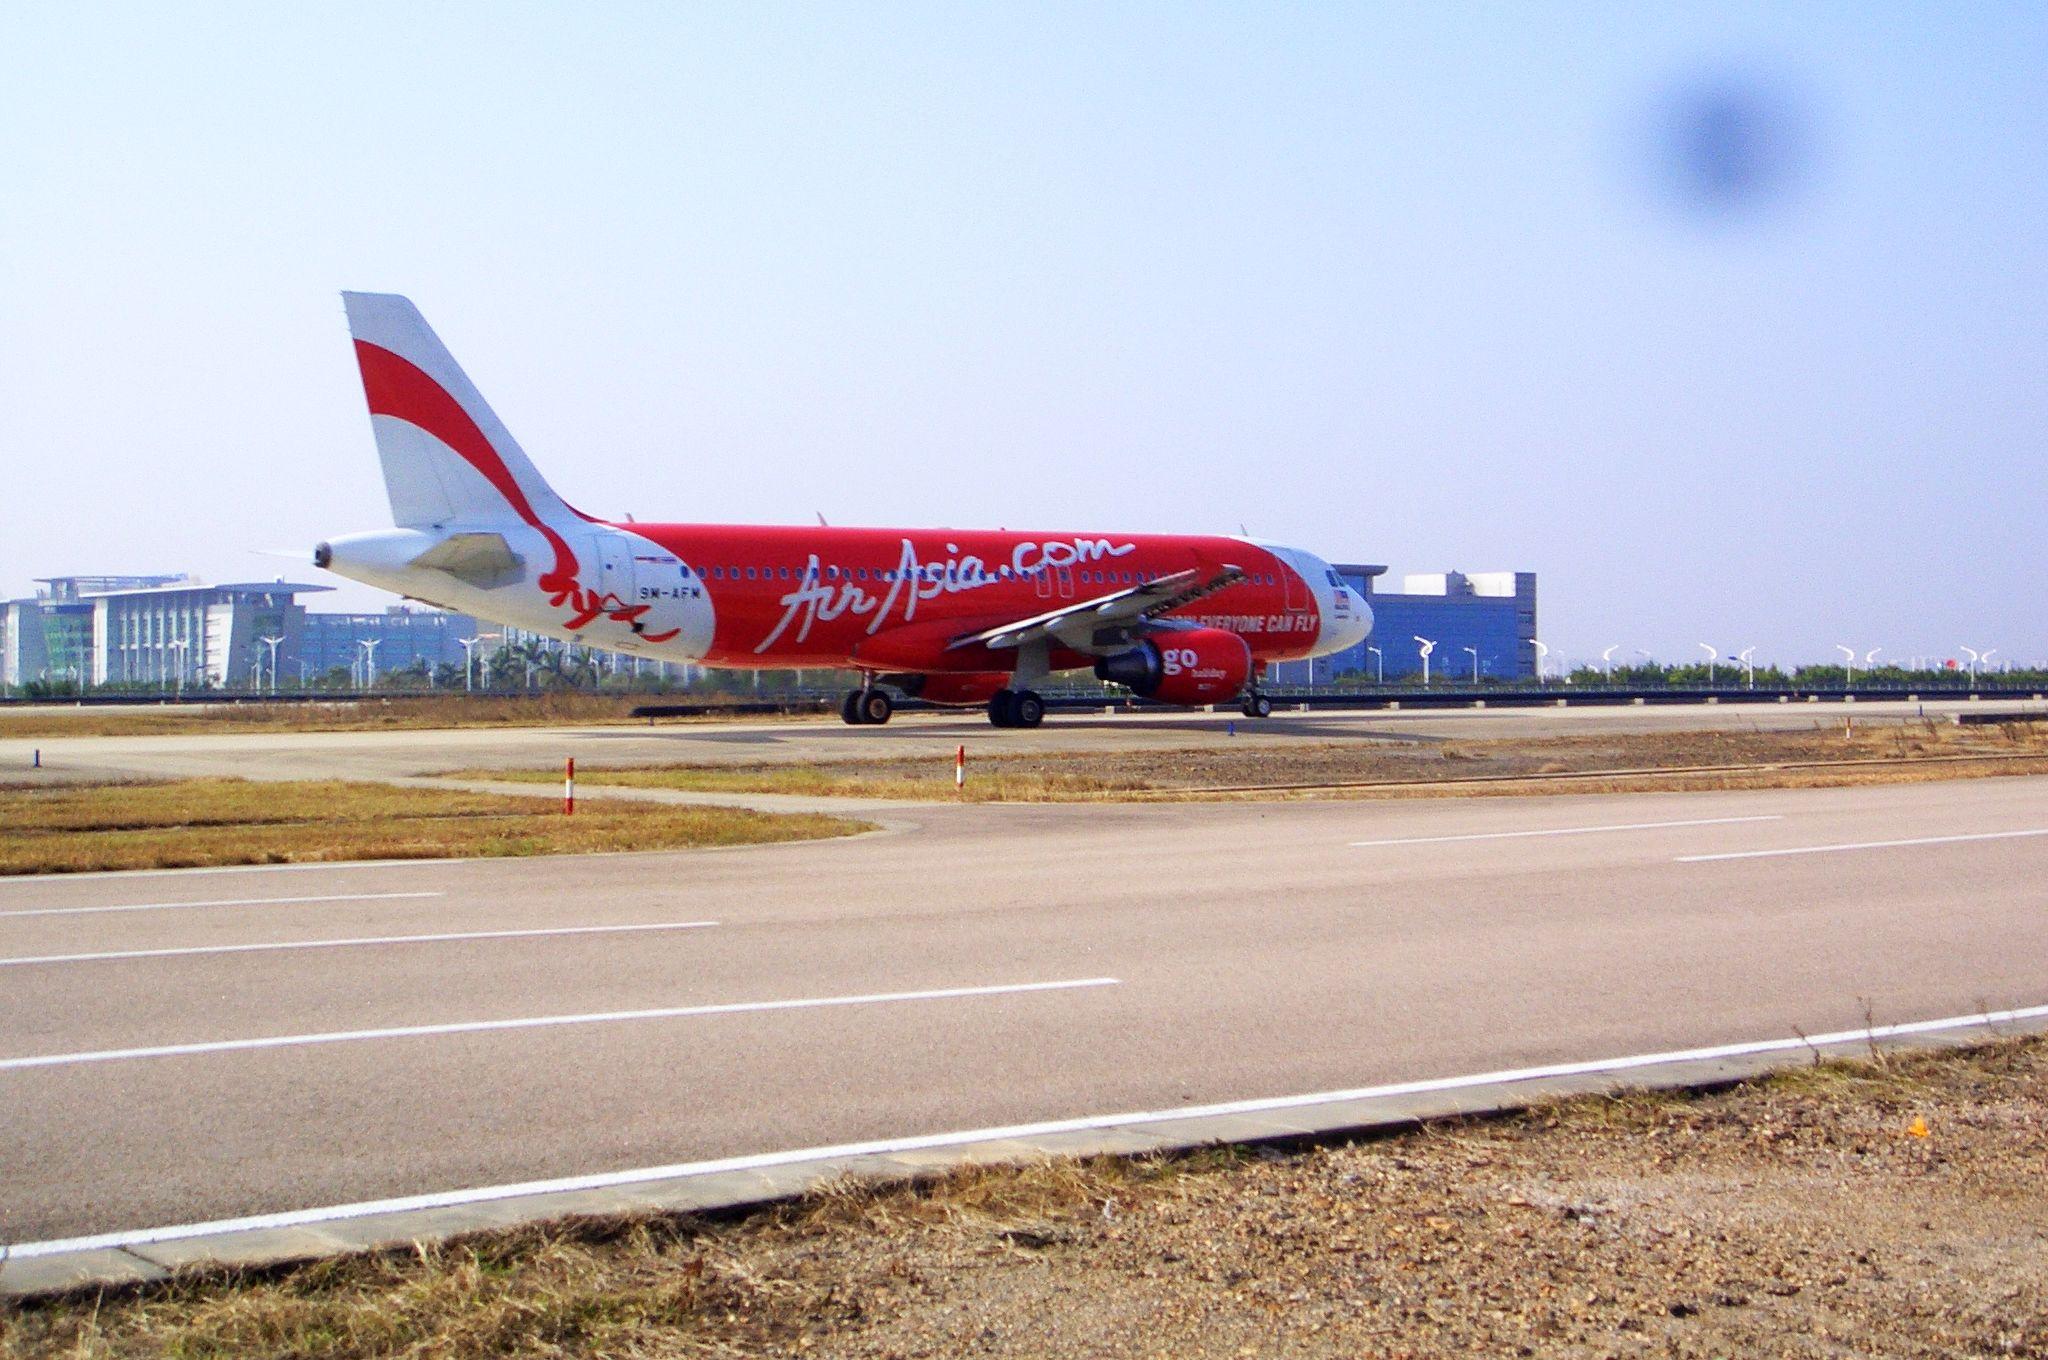 Re:[原创]恢复信心后的第一次发帖,09年第一次活动 AIRBUS A320-200 9M-AFM 广州白云国际机场